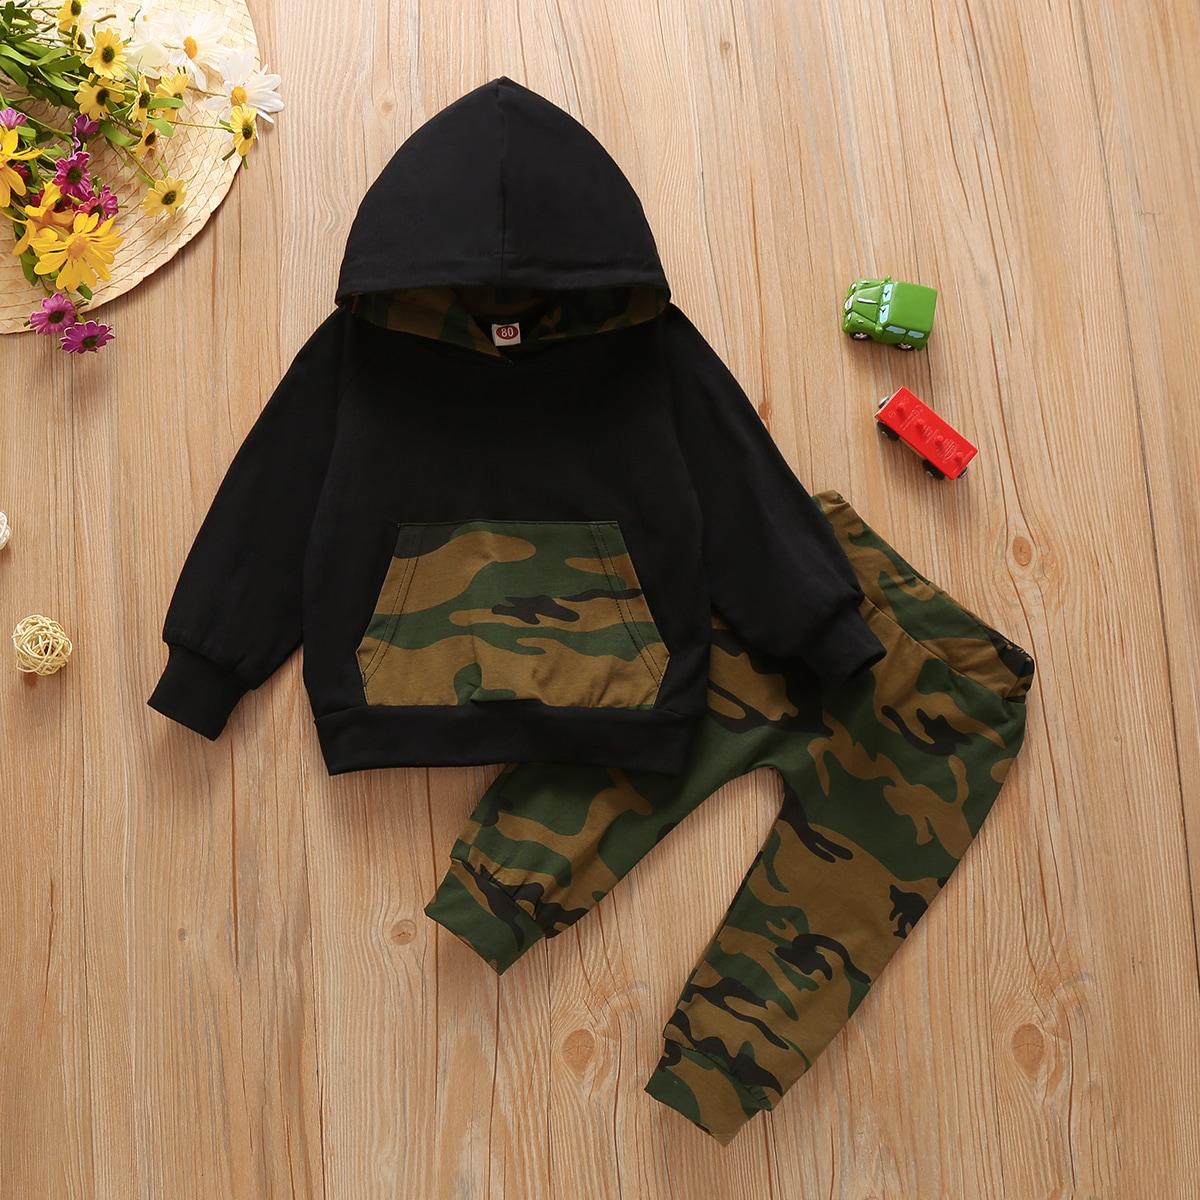 shein Casual Camouflage Baby-setjes Zak